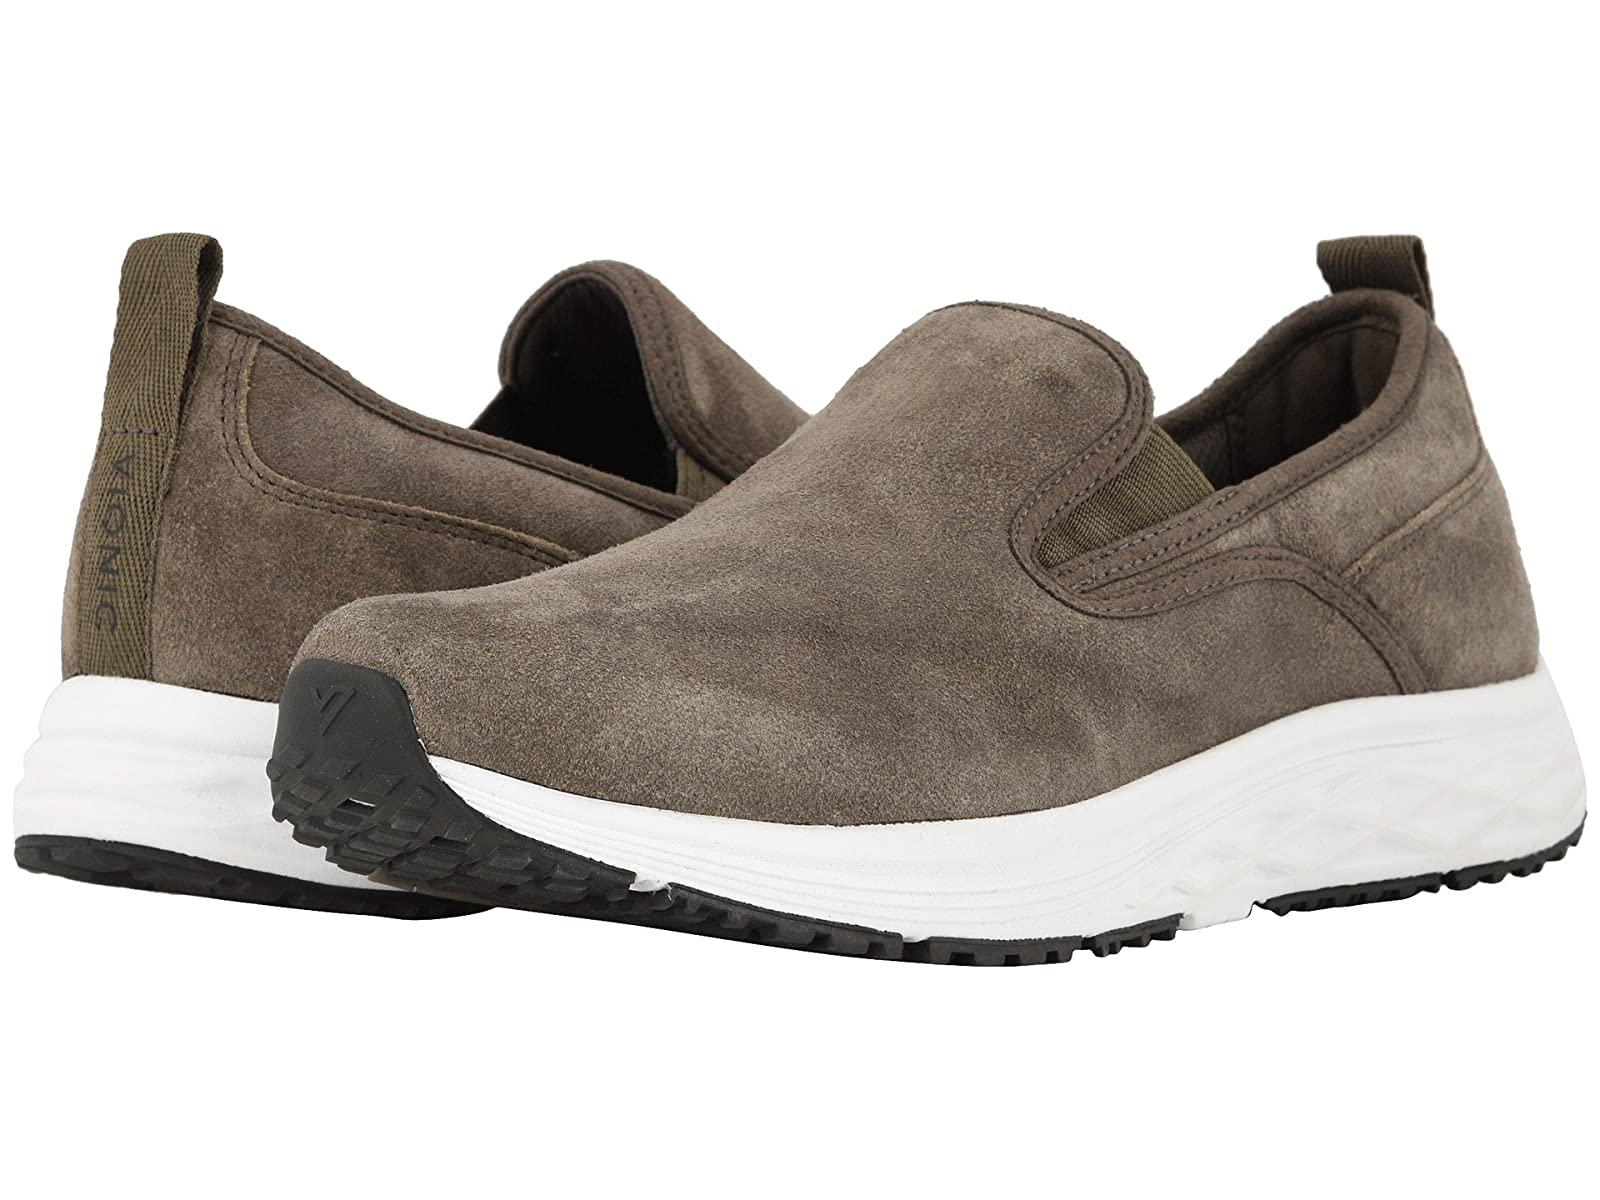 VIONIC BryantAtmospheric grades have affordable shoes